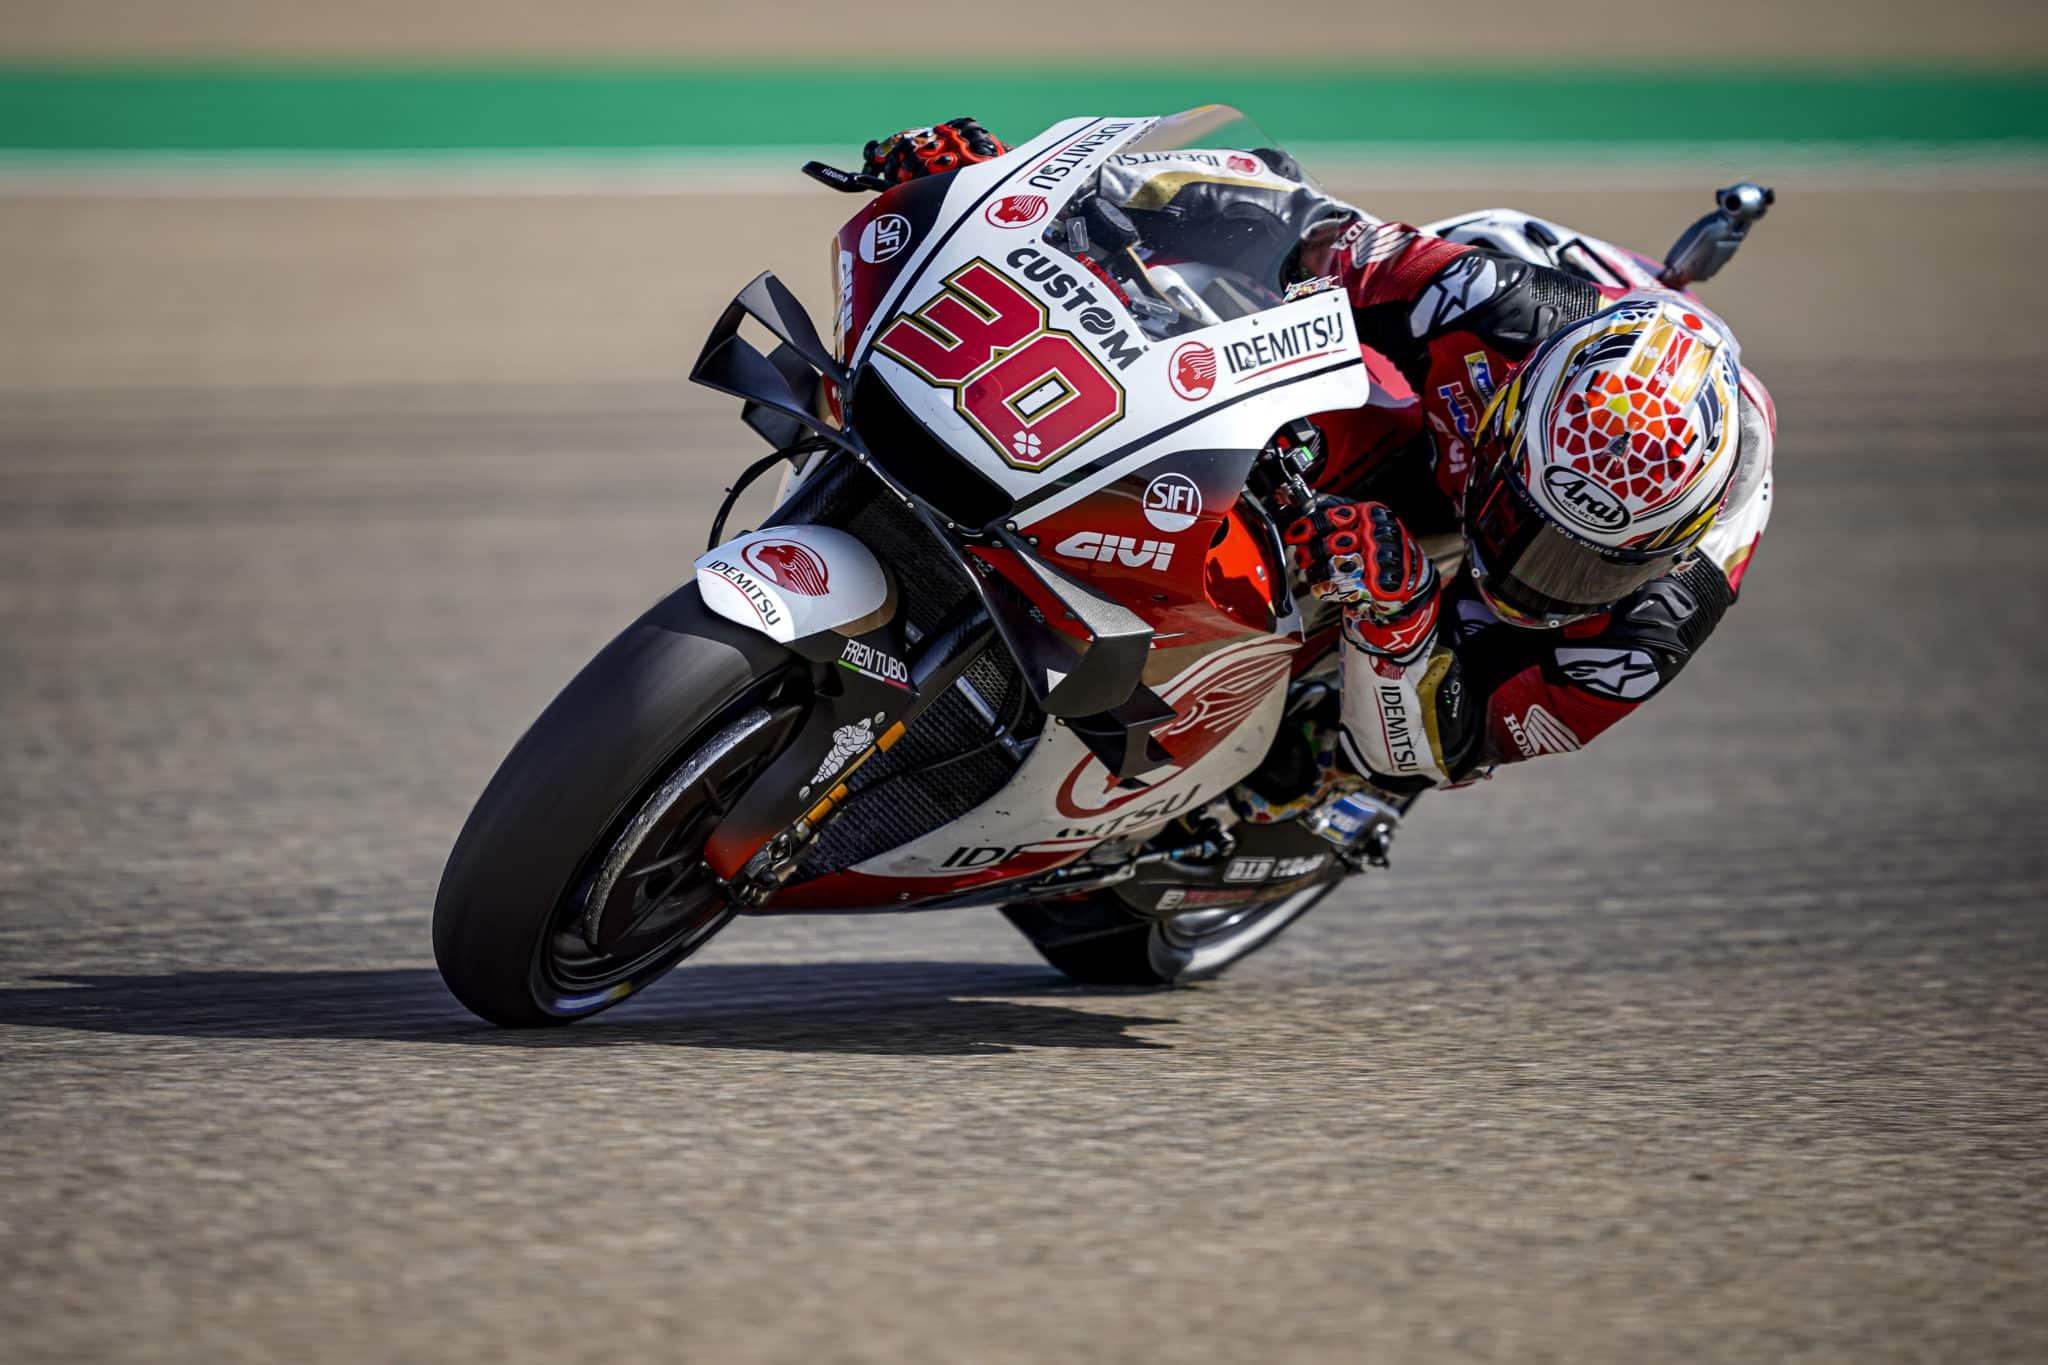 MotoGP Nakagami